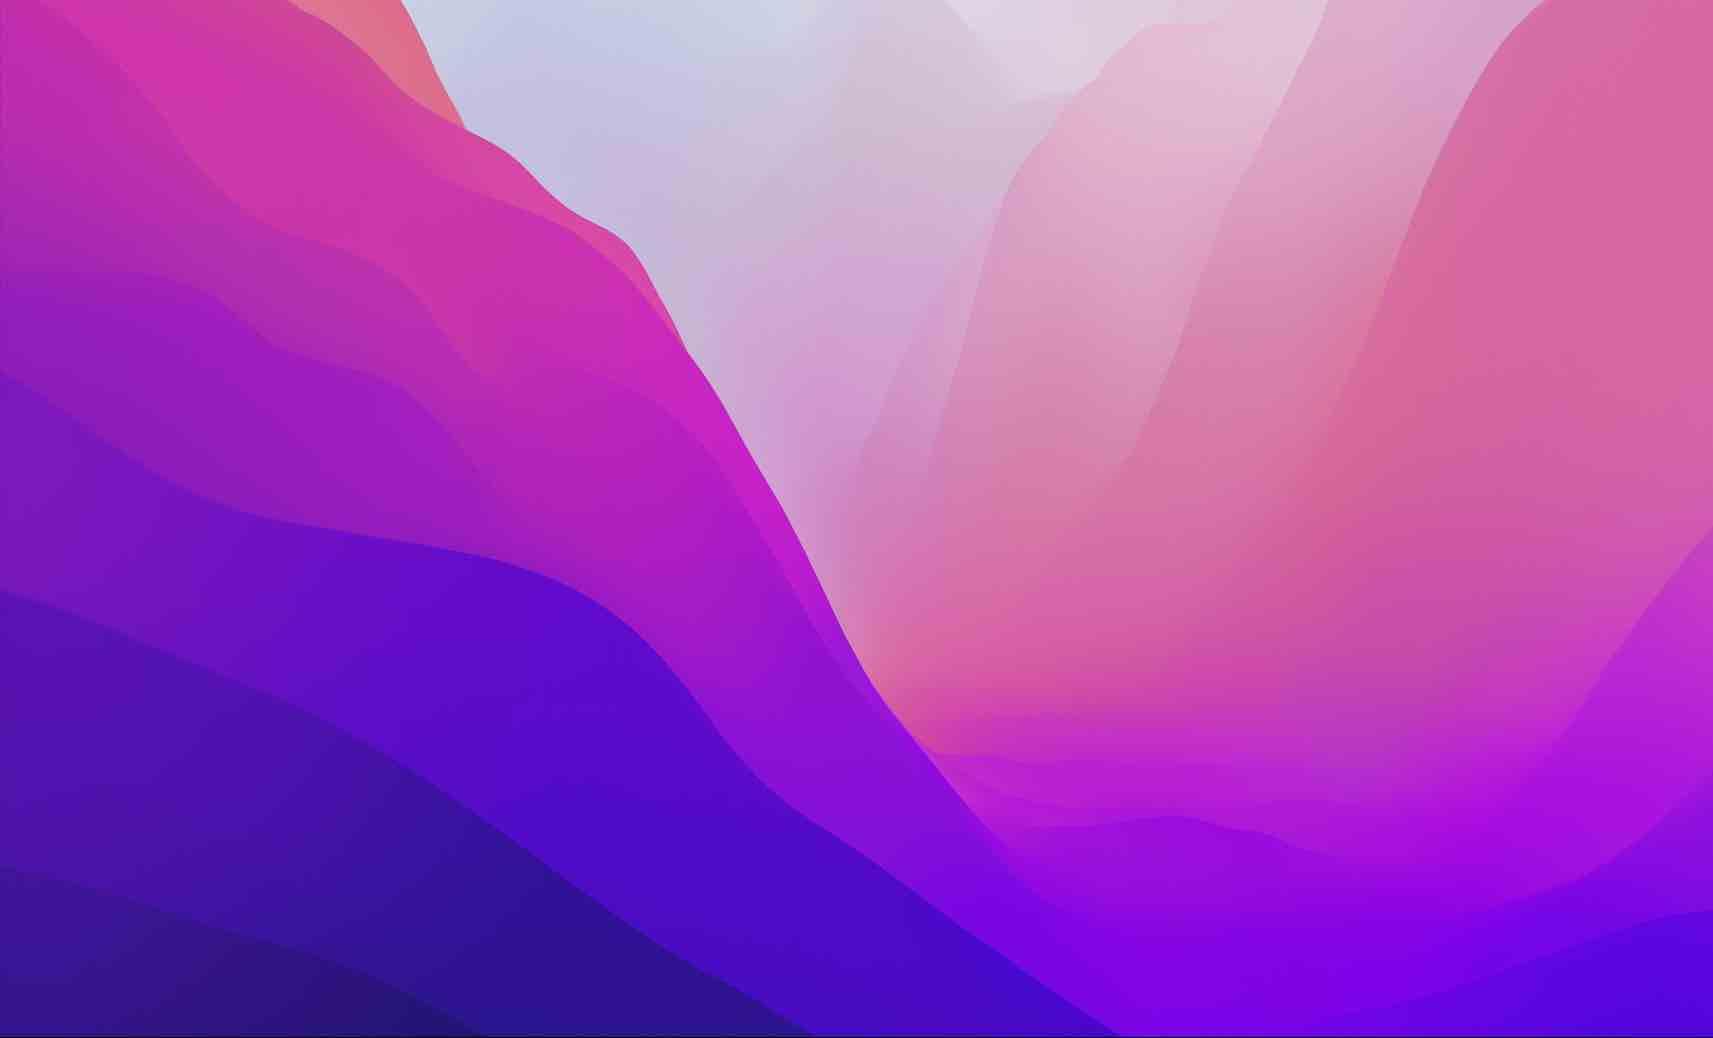 macos 12 wallpapers, macos 12 wallpapers download, download macos 12 wallpapers